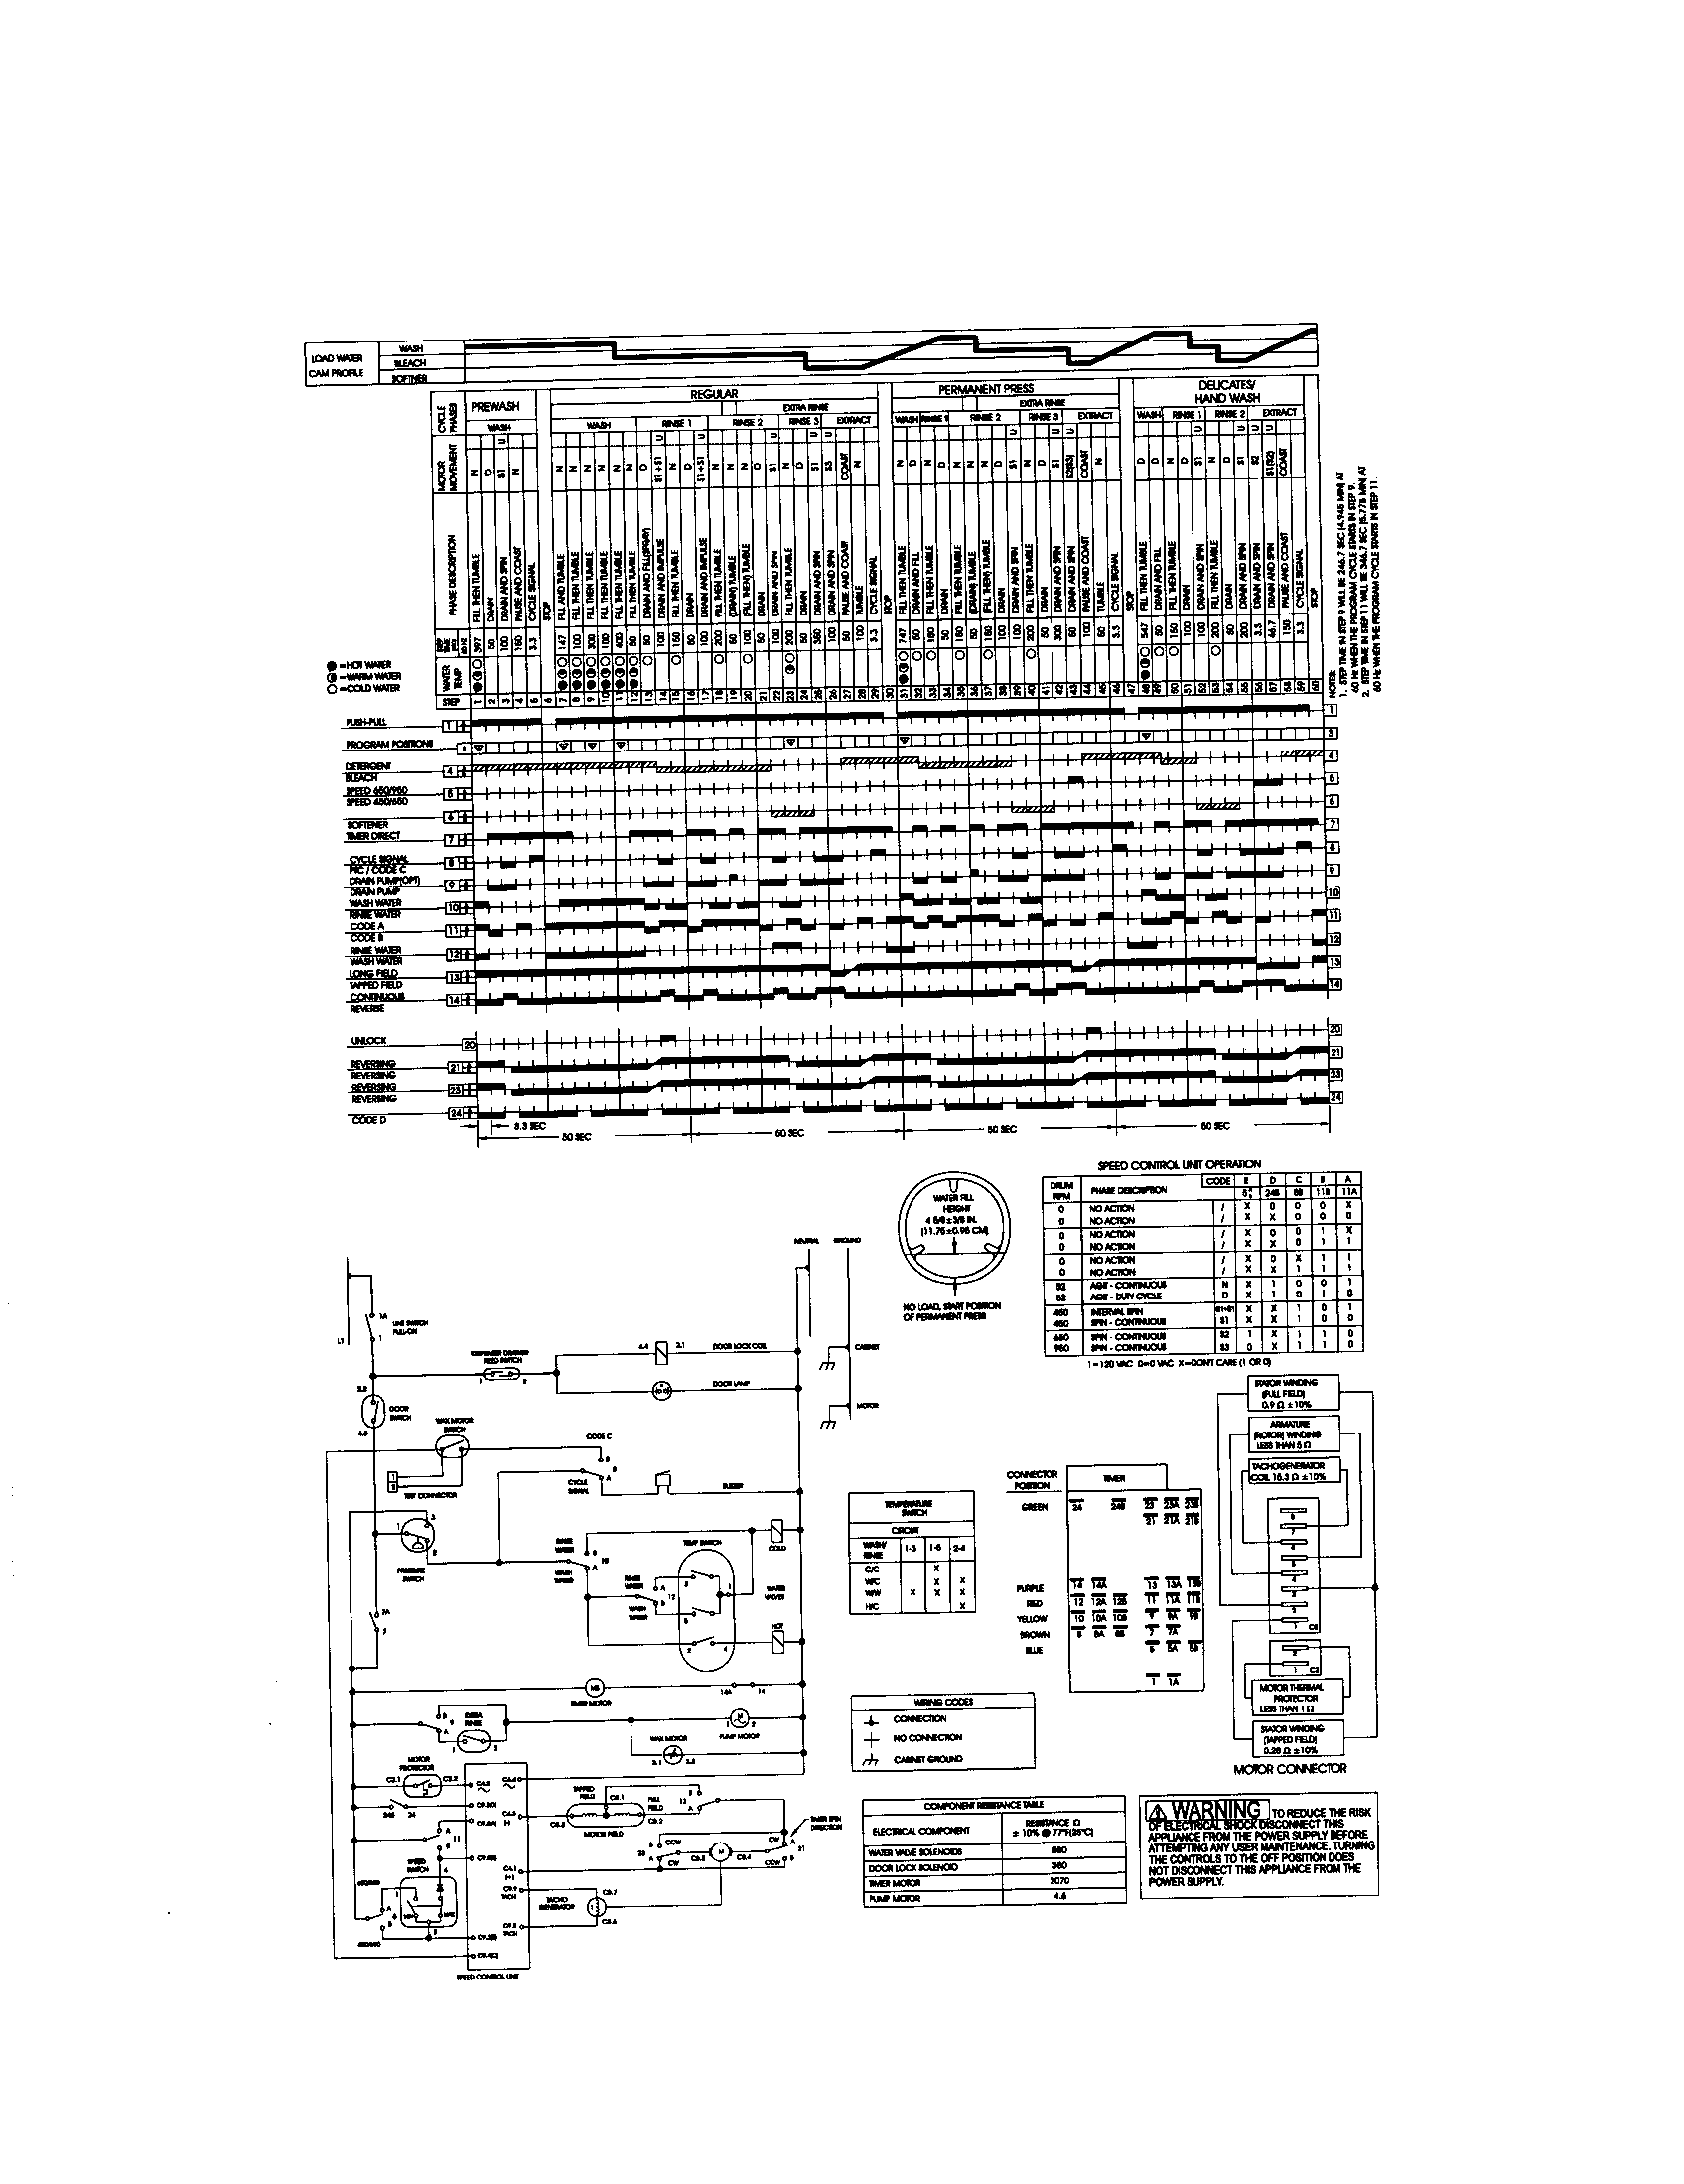 34 Lg Tromm Washer Parts Diagram